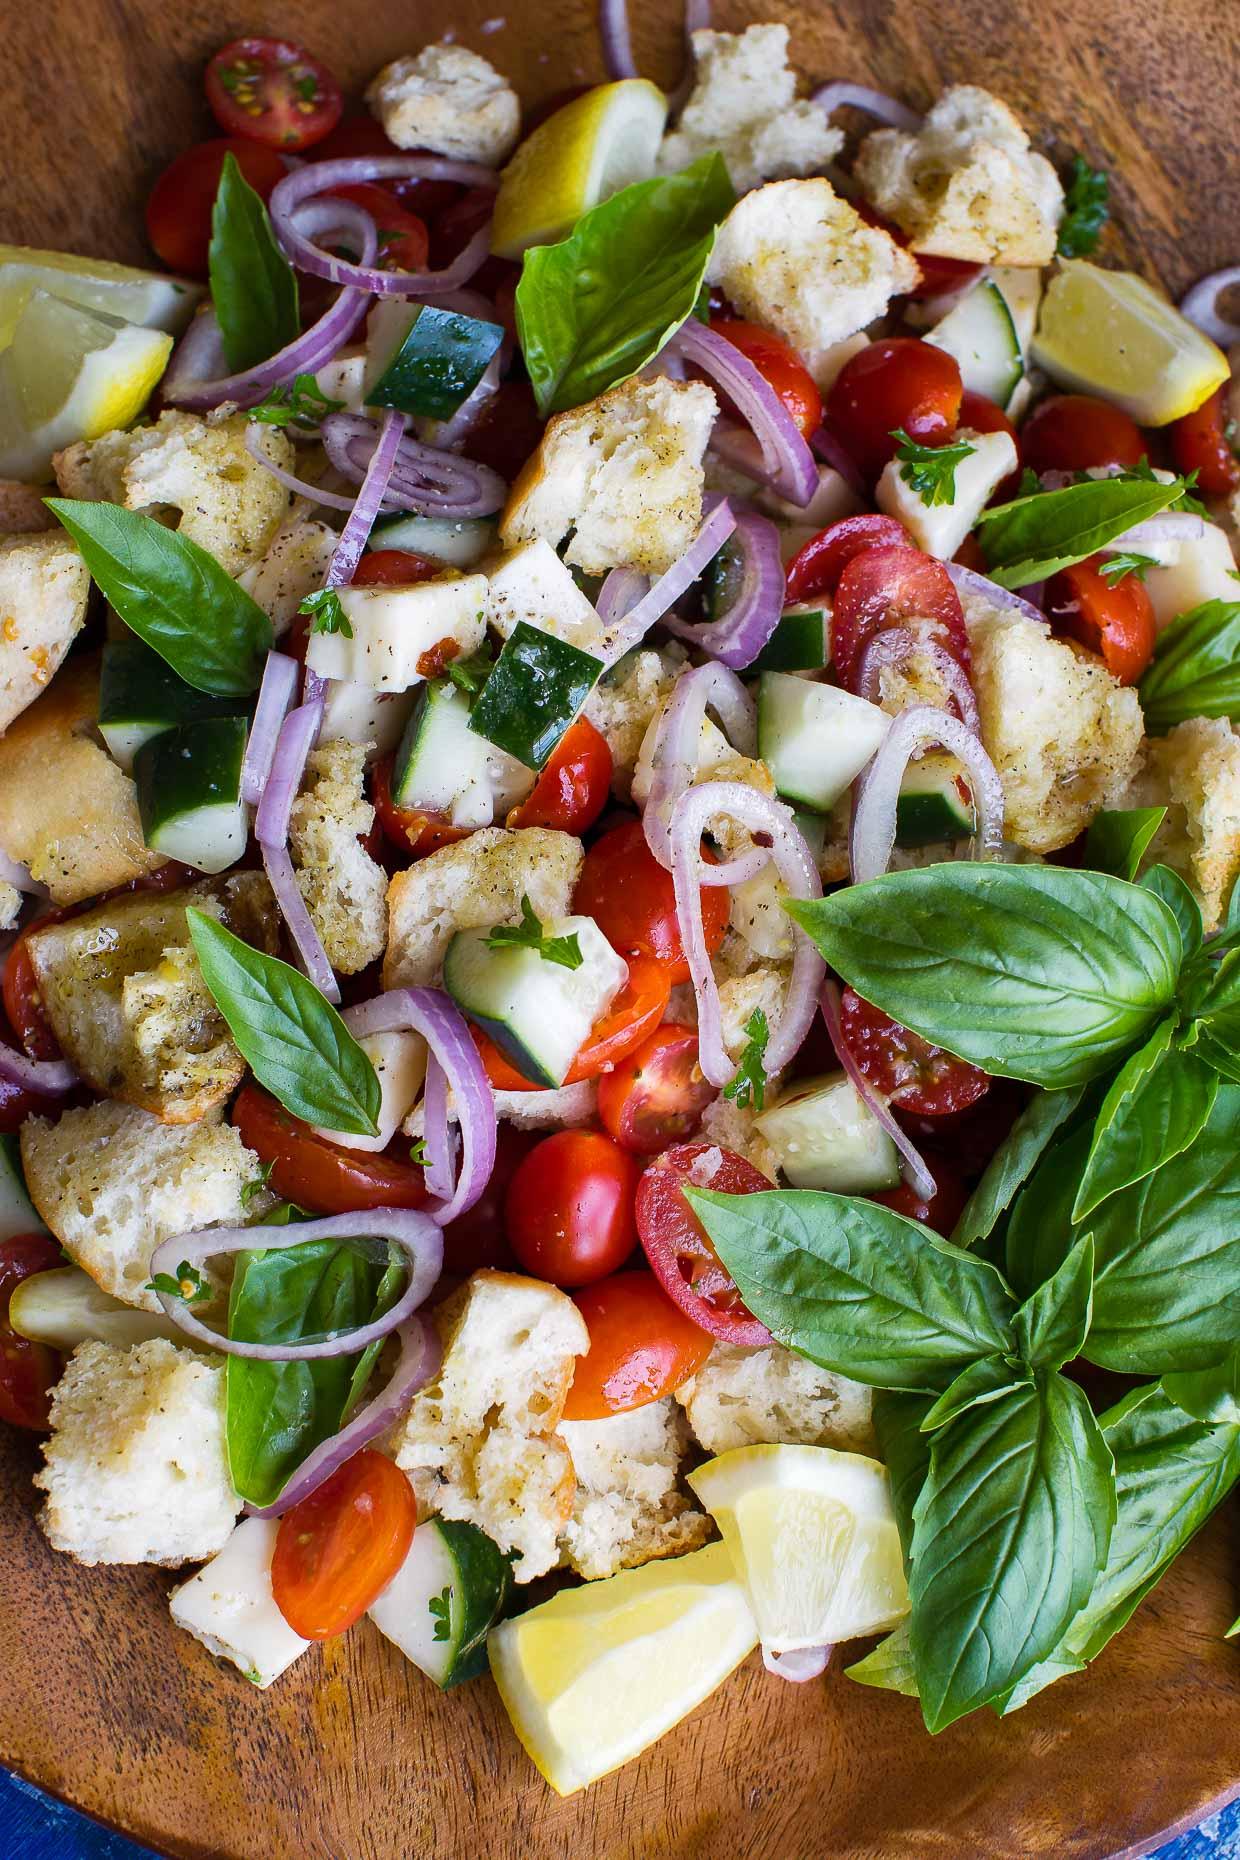 Tomato Basil Panzanella Tuscan Bread Salad